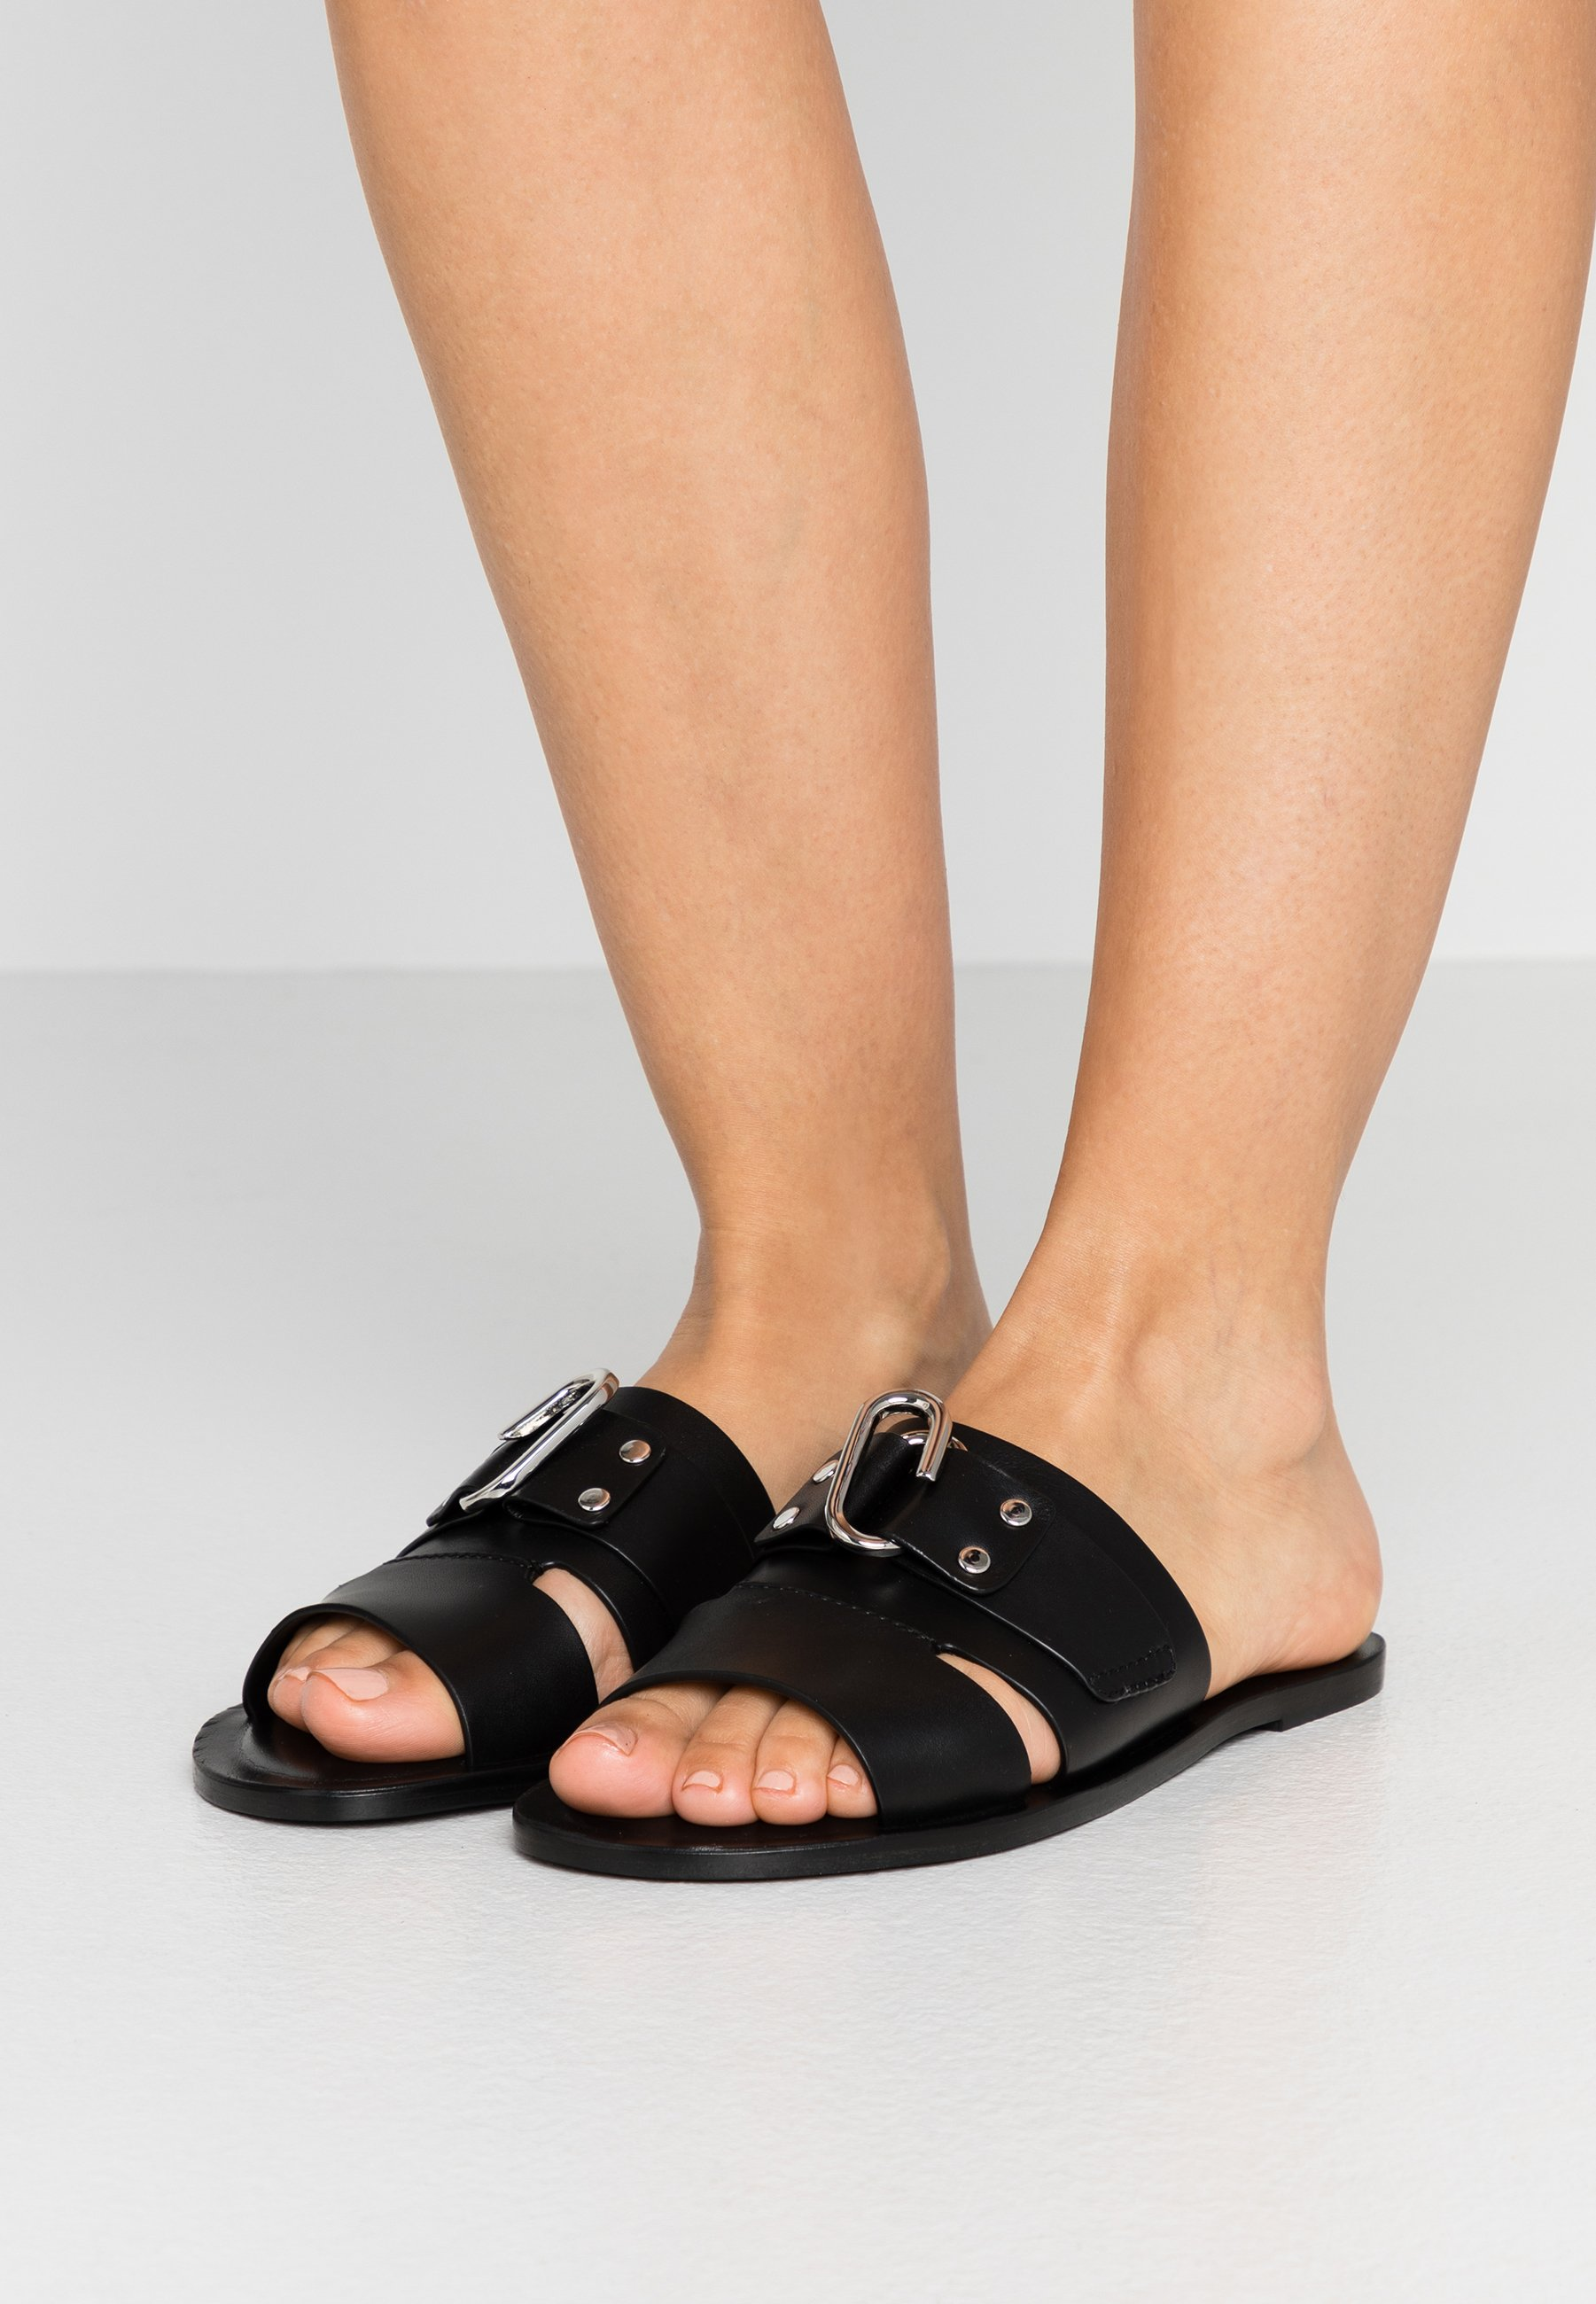 3.1 Phillip Lim Alix Flat Slide - Sandalias Planas Black